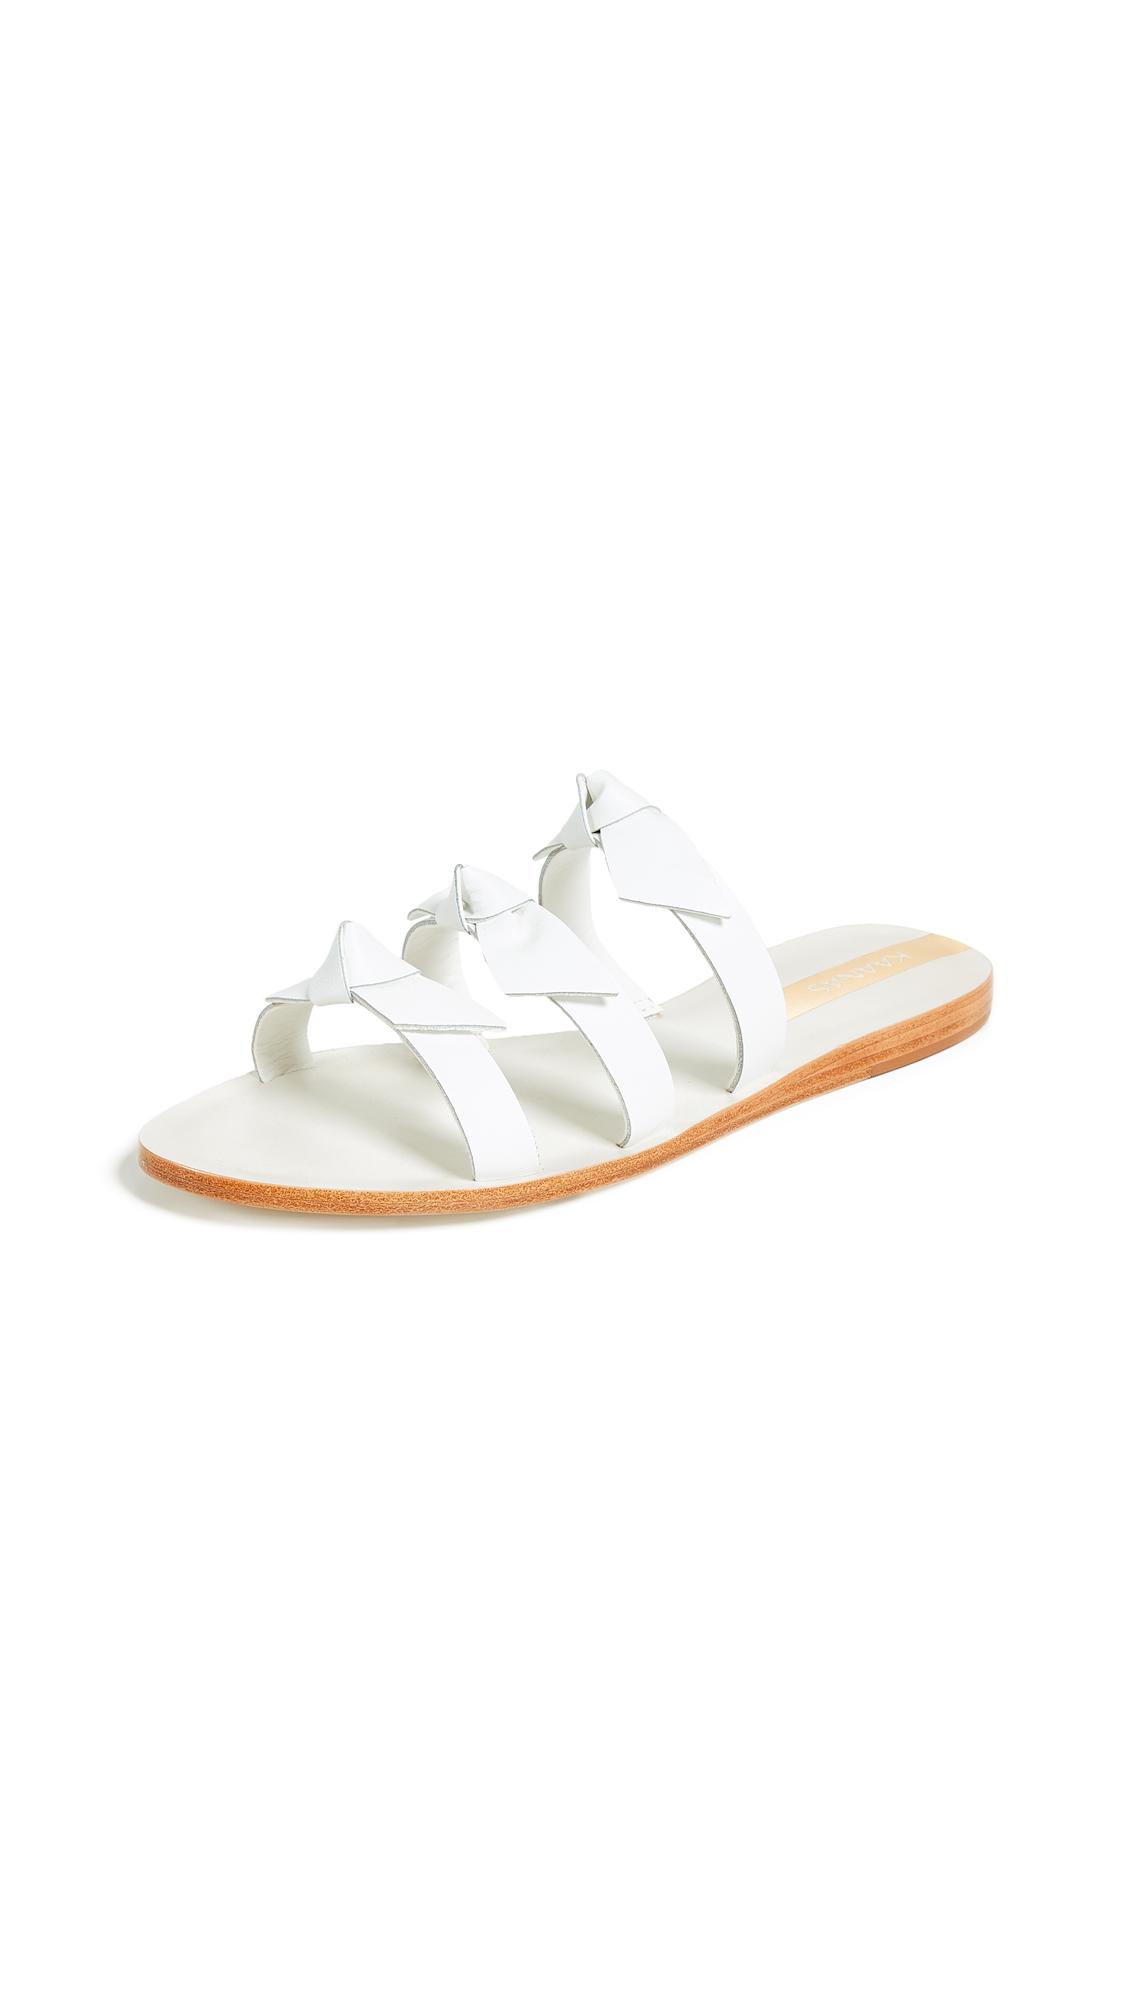 KAANAS Recife Bow Sandals - White